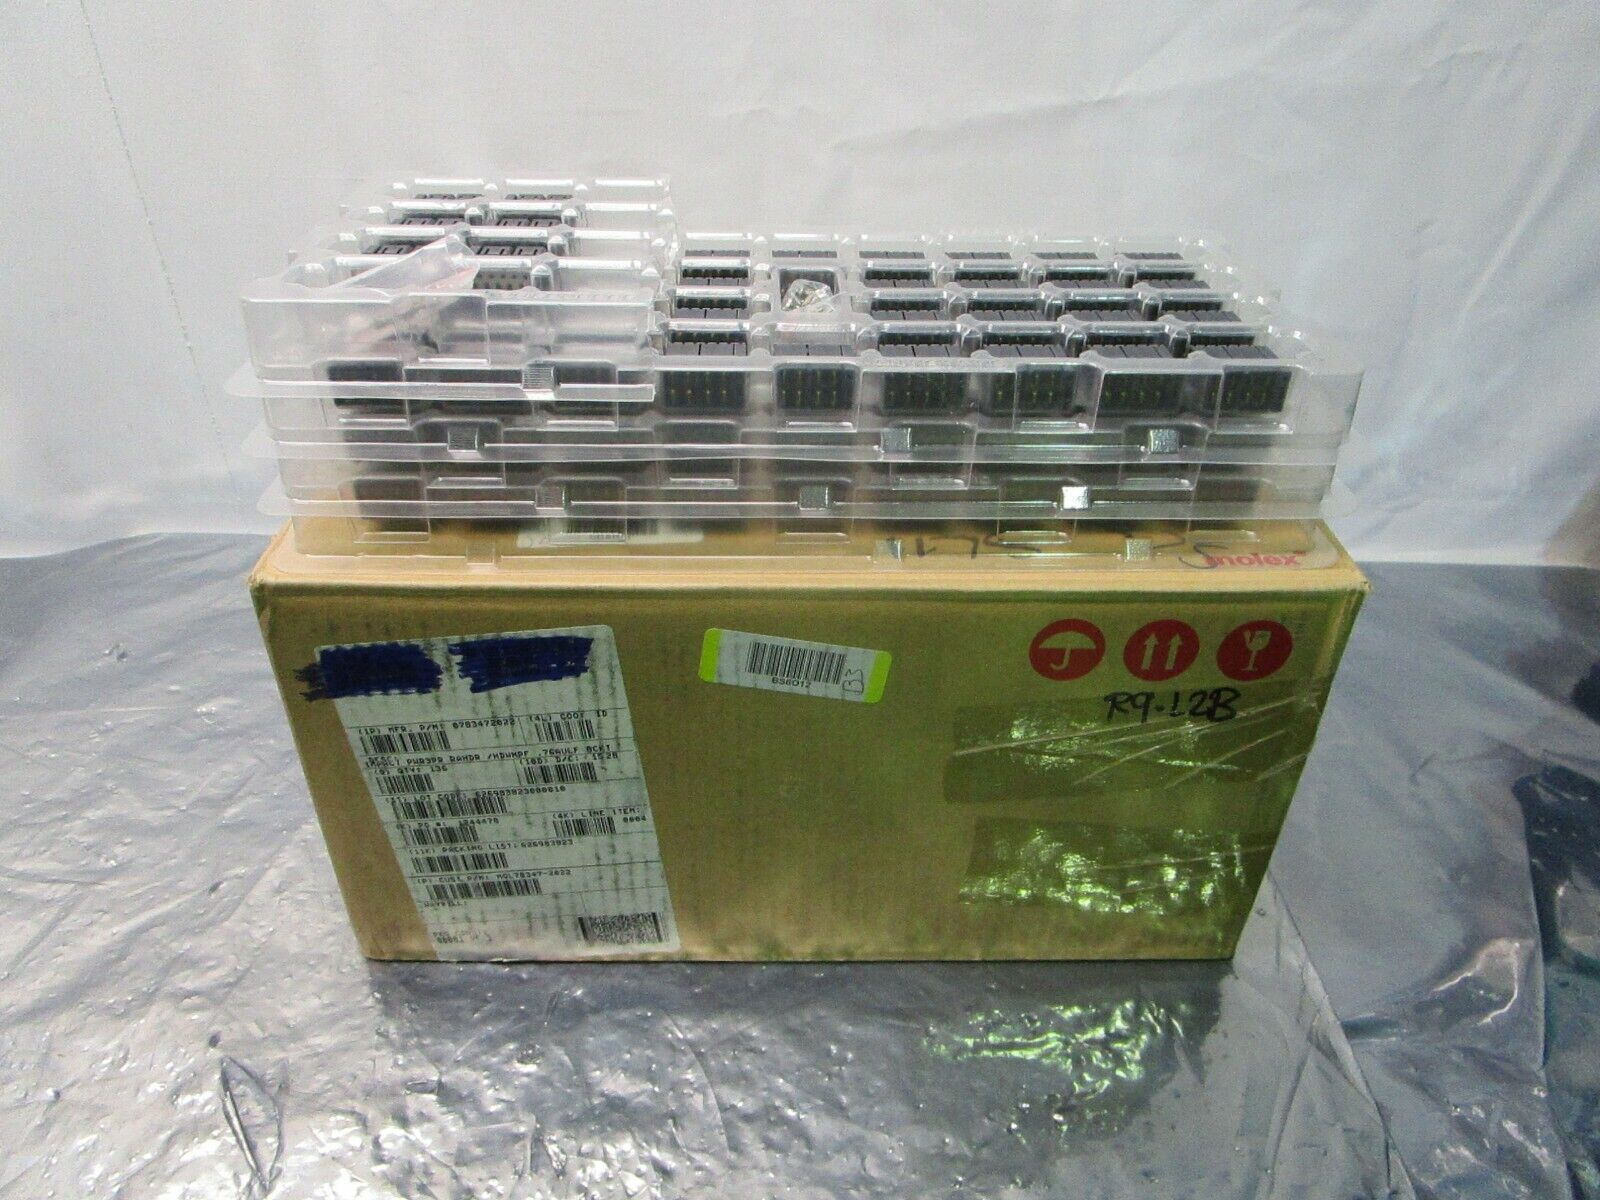 1 Lot of 108 Molex 0783472022 Impact Pwr3Pr RAHdr /HDwnPF .76AuLF 8Ckt, 101997